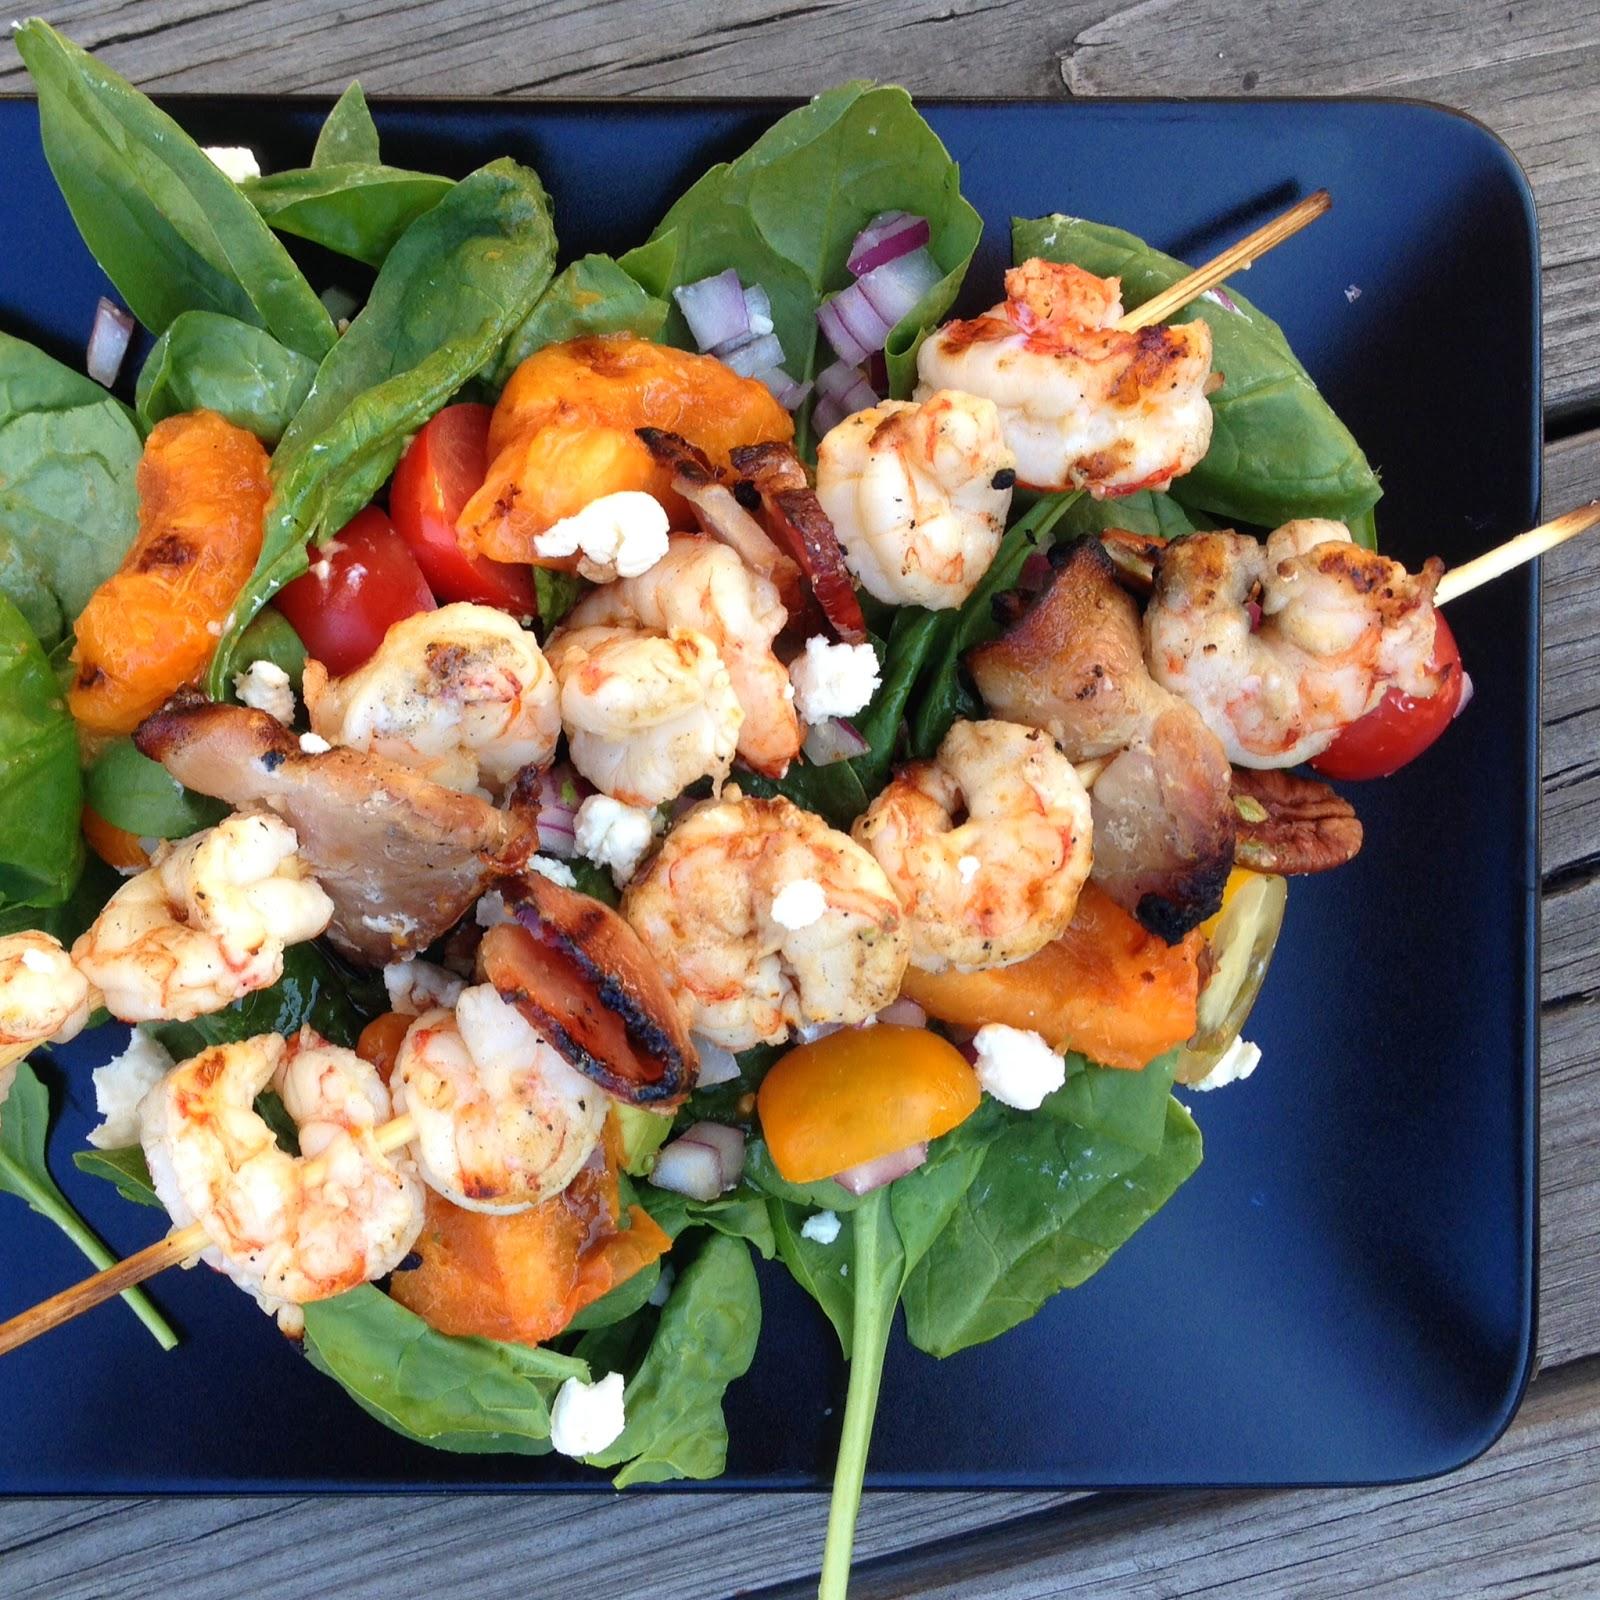 ... -So-SAHM: Grub It Up: Citrus Bacon Shrimp + Grilled Stone Fruit Salad